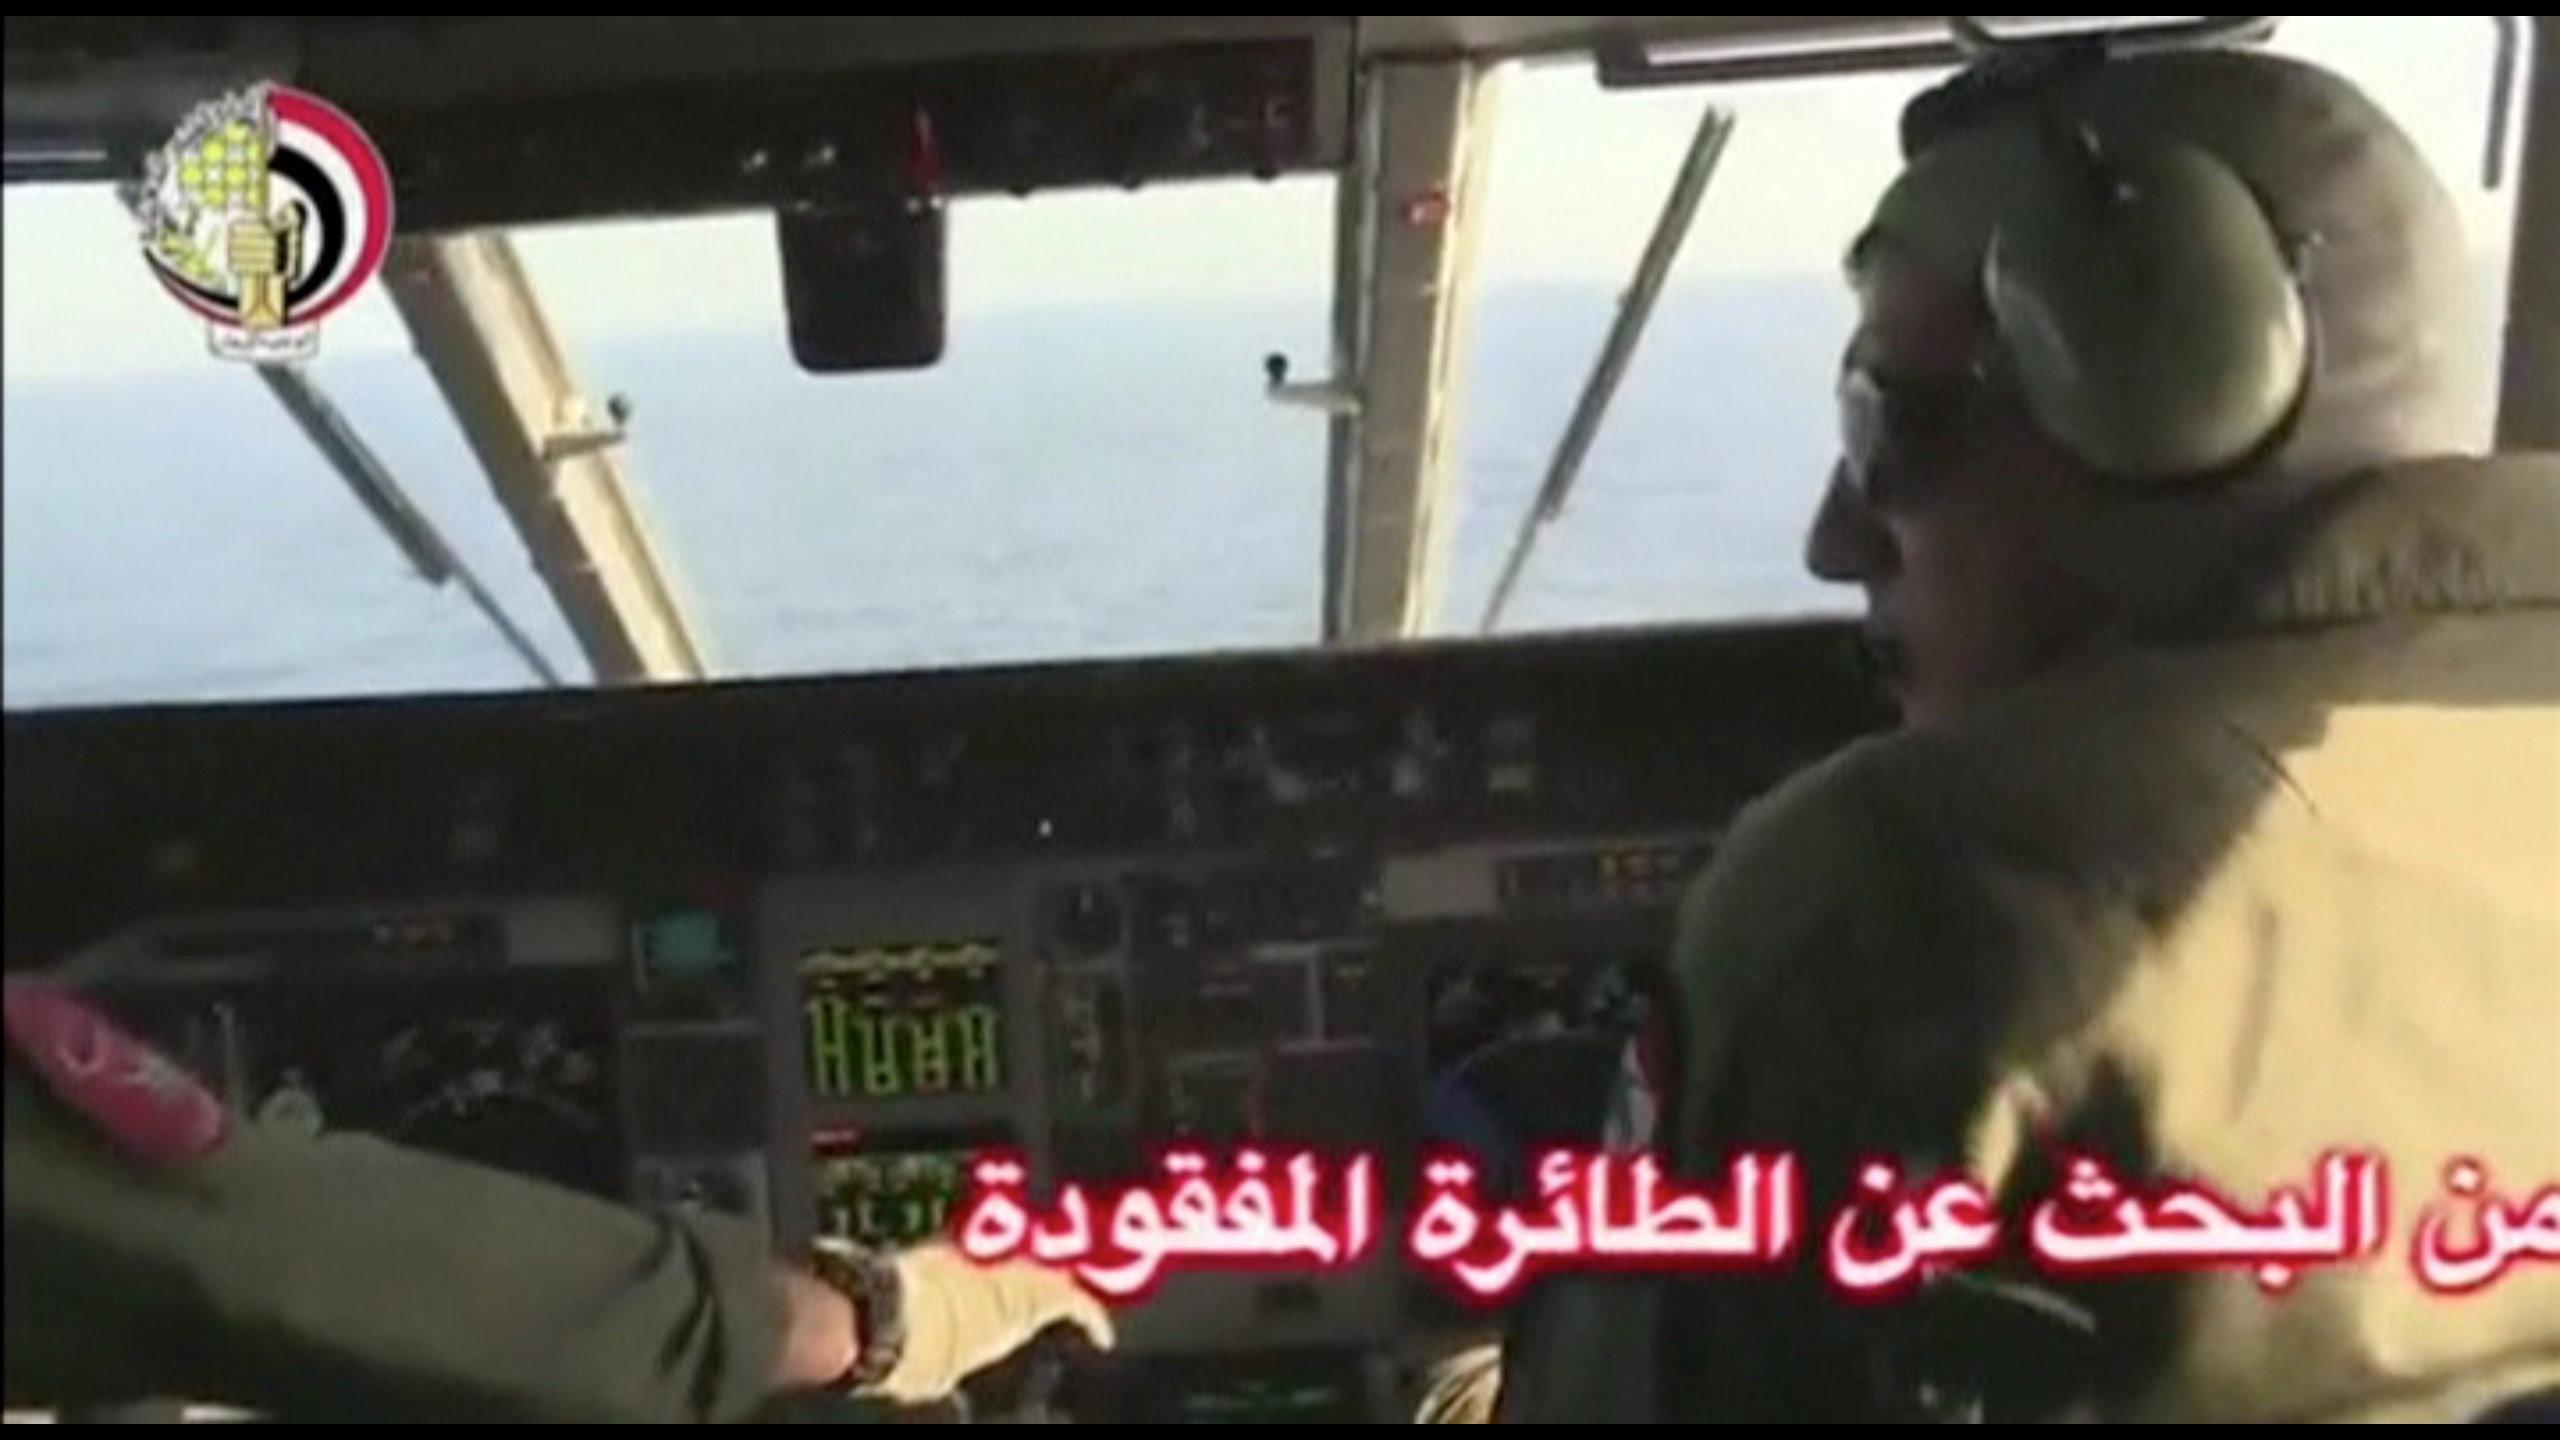 Debris From Missing EgyptAir Plane Found, Egyptian Military